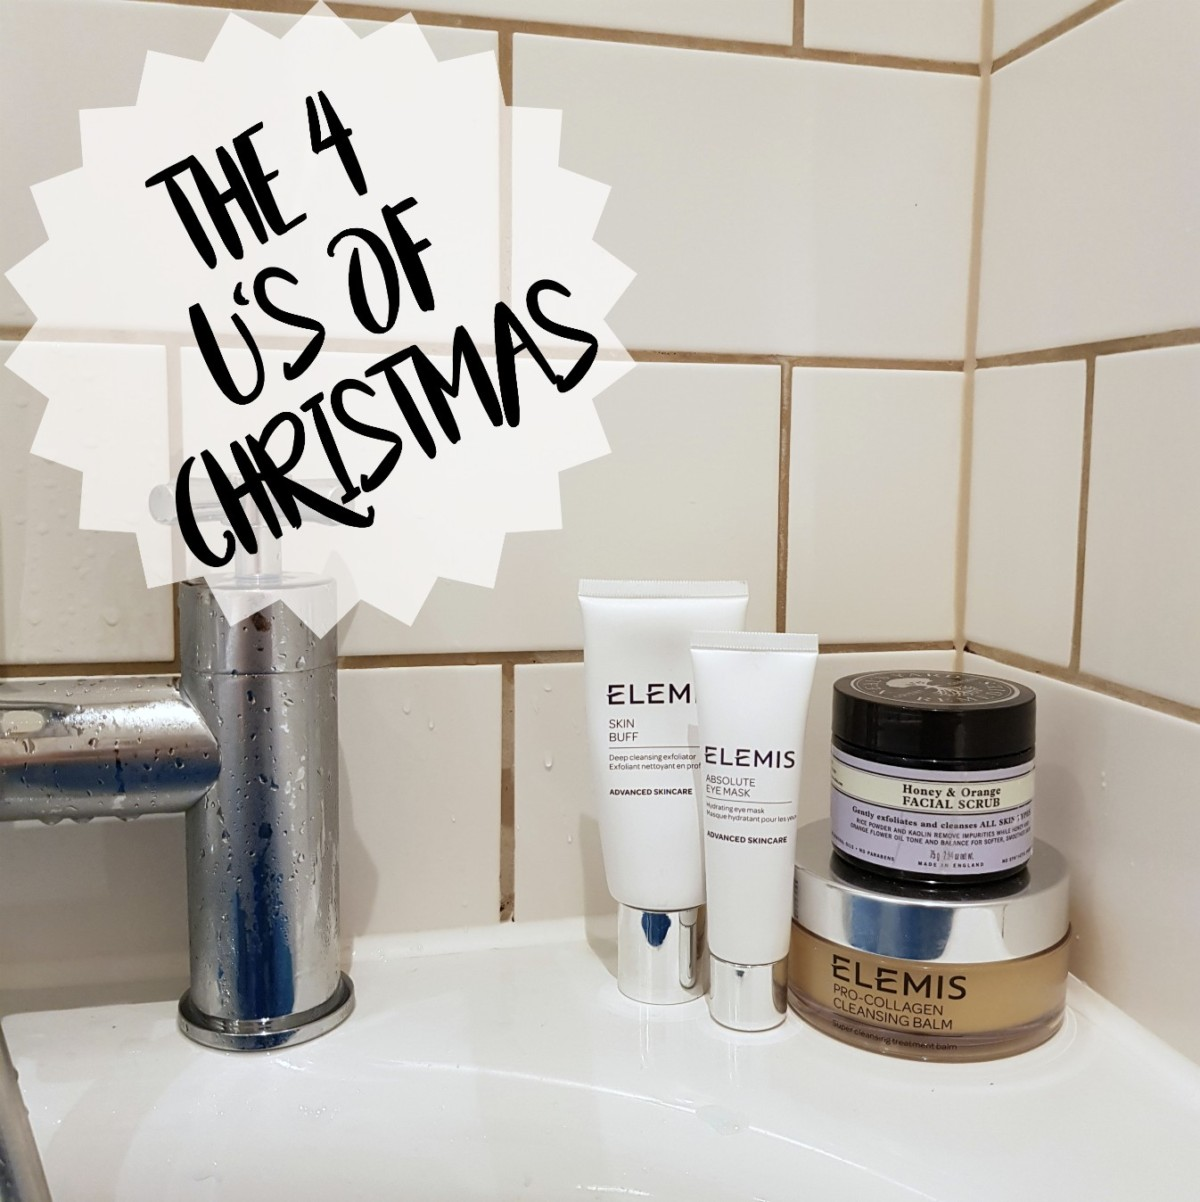 BLOGMAS, Christmas, The 4 U's of Christmas, Festive Season, Festive, Elemis, Neal's Yard, Skin Care, Skin, Beauty, Face, Bath, Bath Time, Chill, Relax, Unwind, Unburden, Under My Duvet, Understand, Blog A Book Etc, Fay